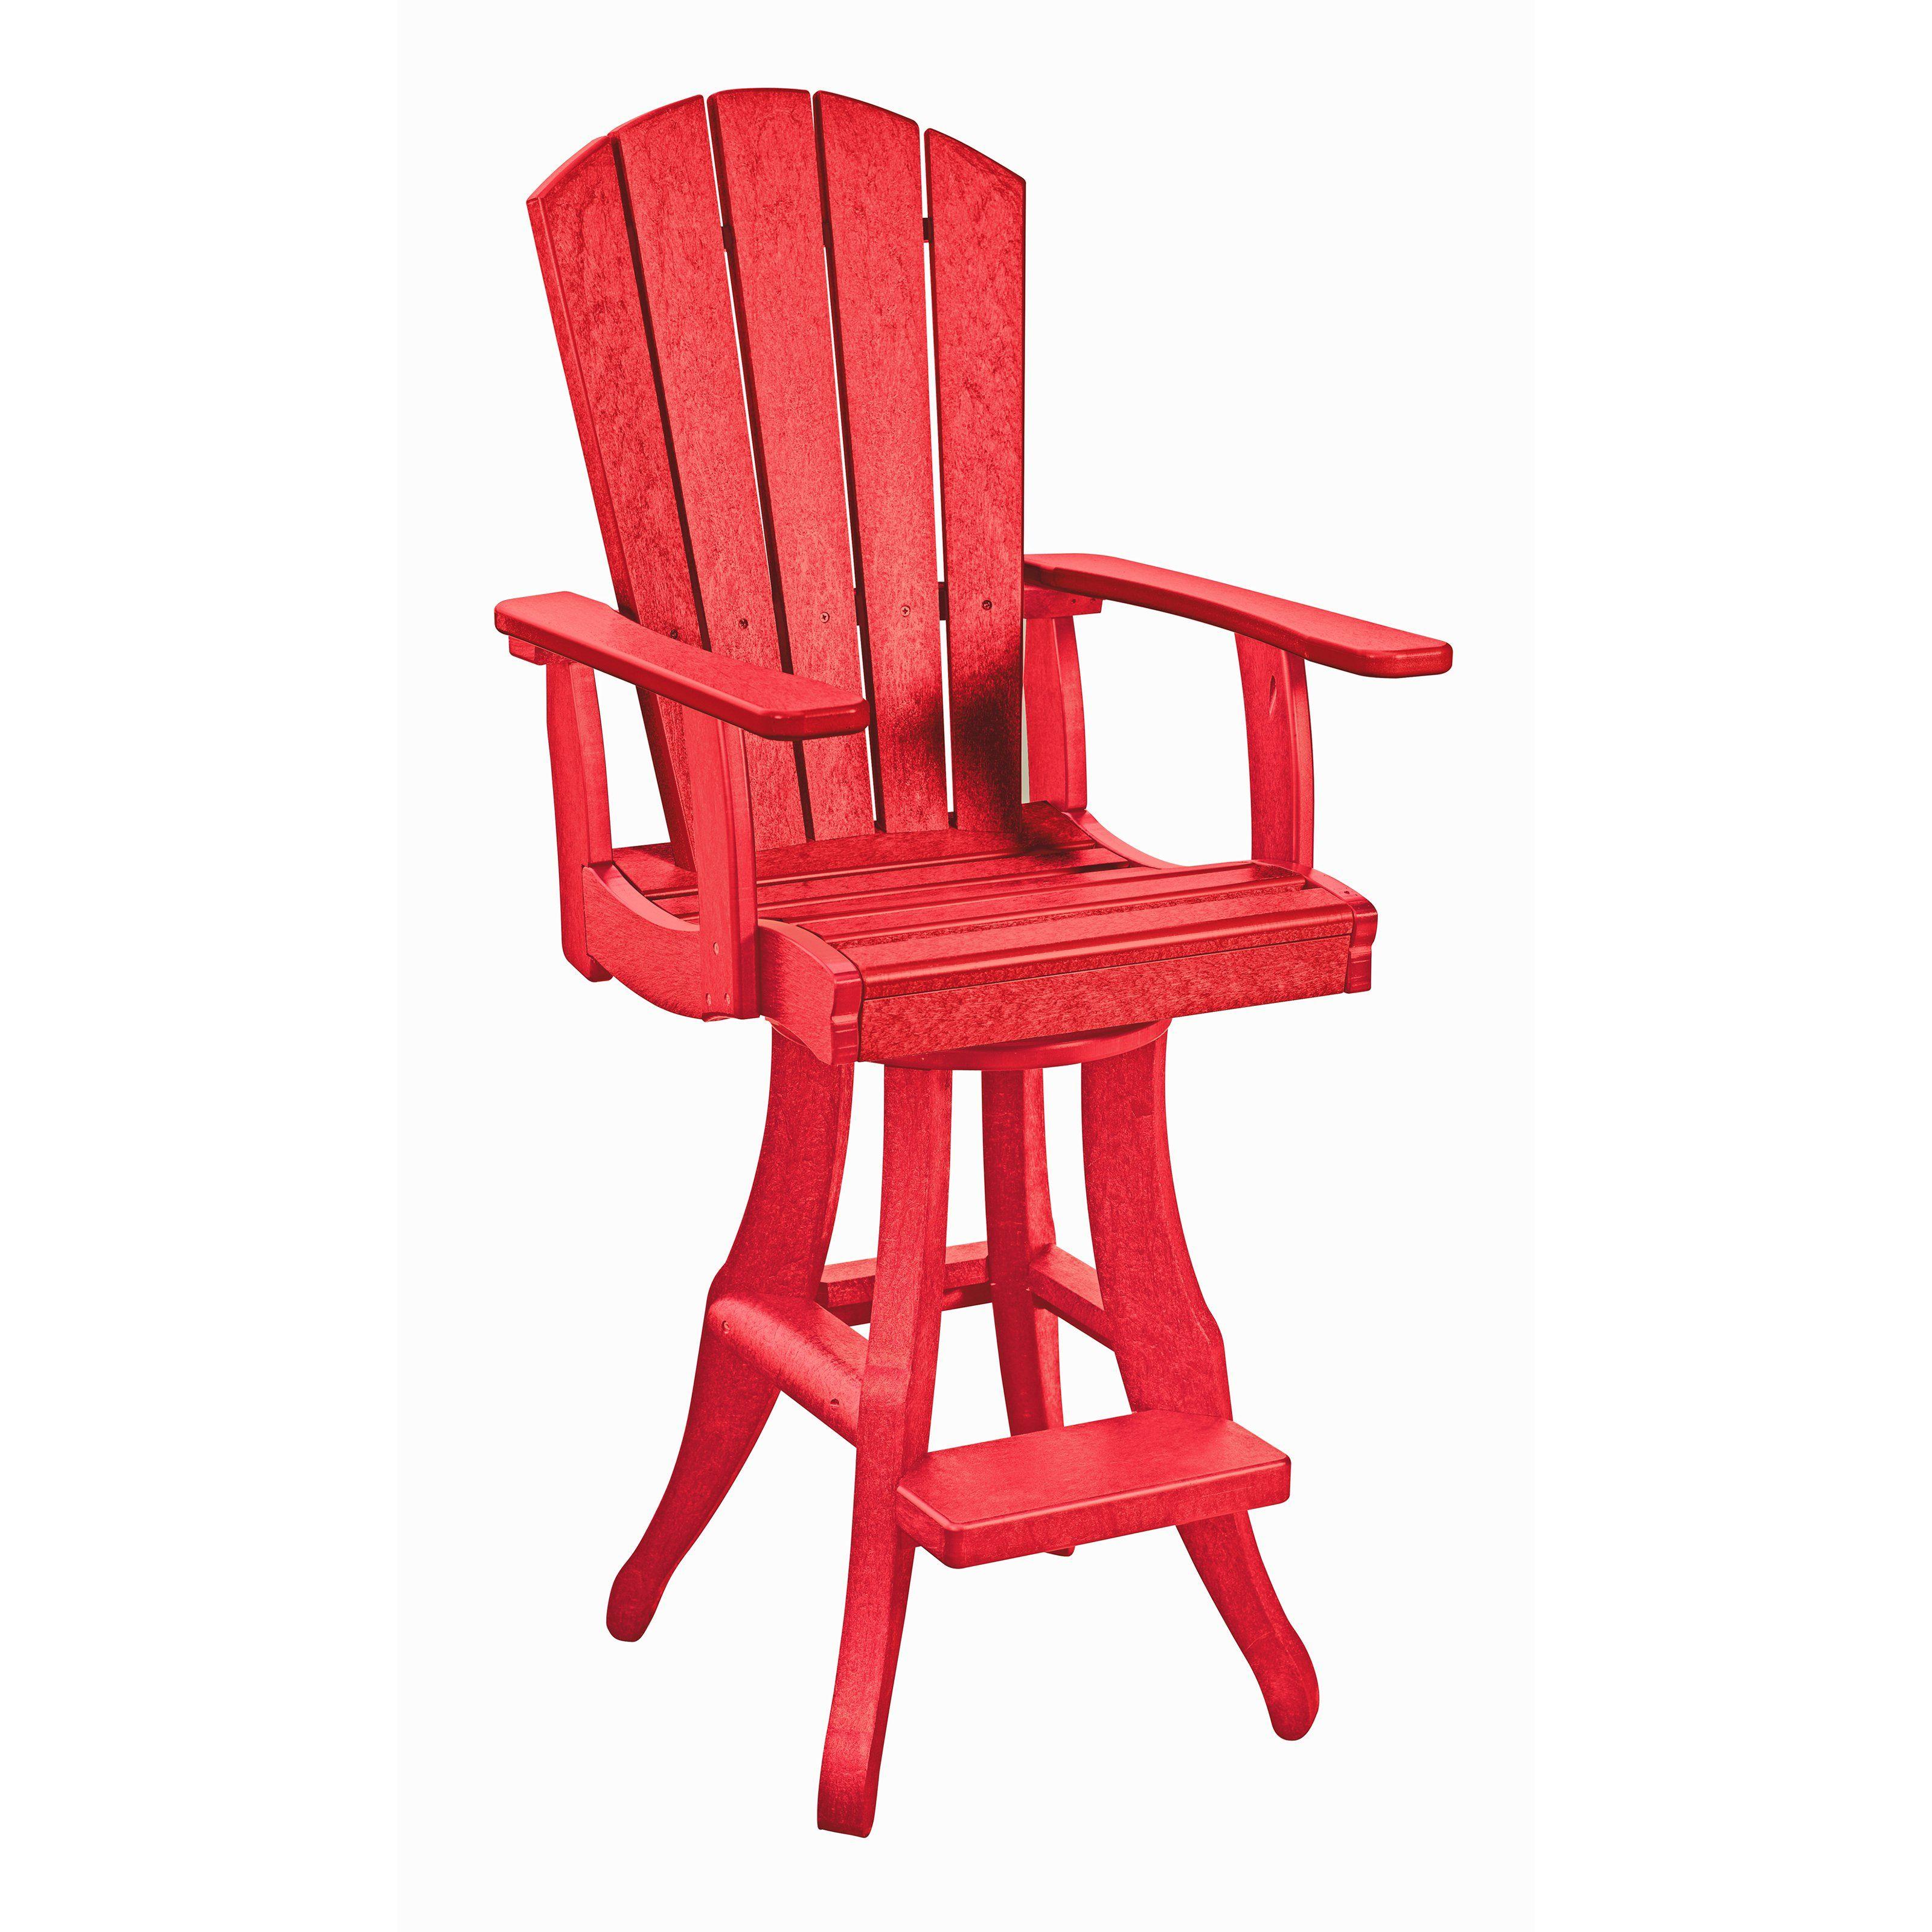 CR Plastic Generations Swivel Arm Pub Chair from